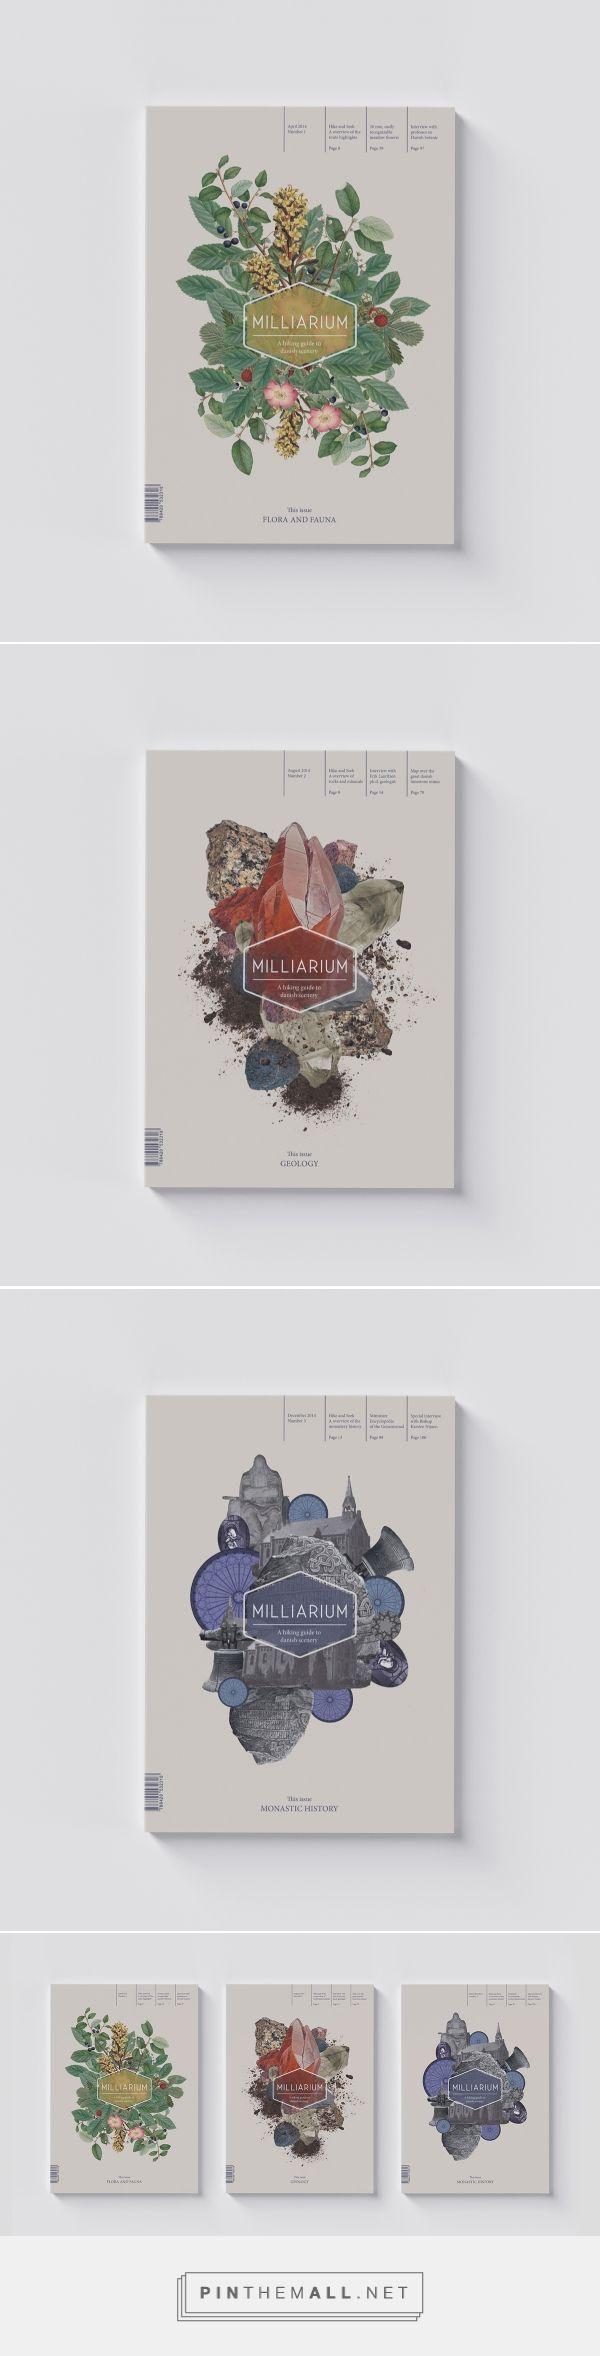 Milliarium Magazine on Behance - created via https://pinthemall.net